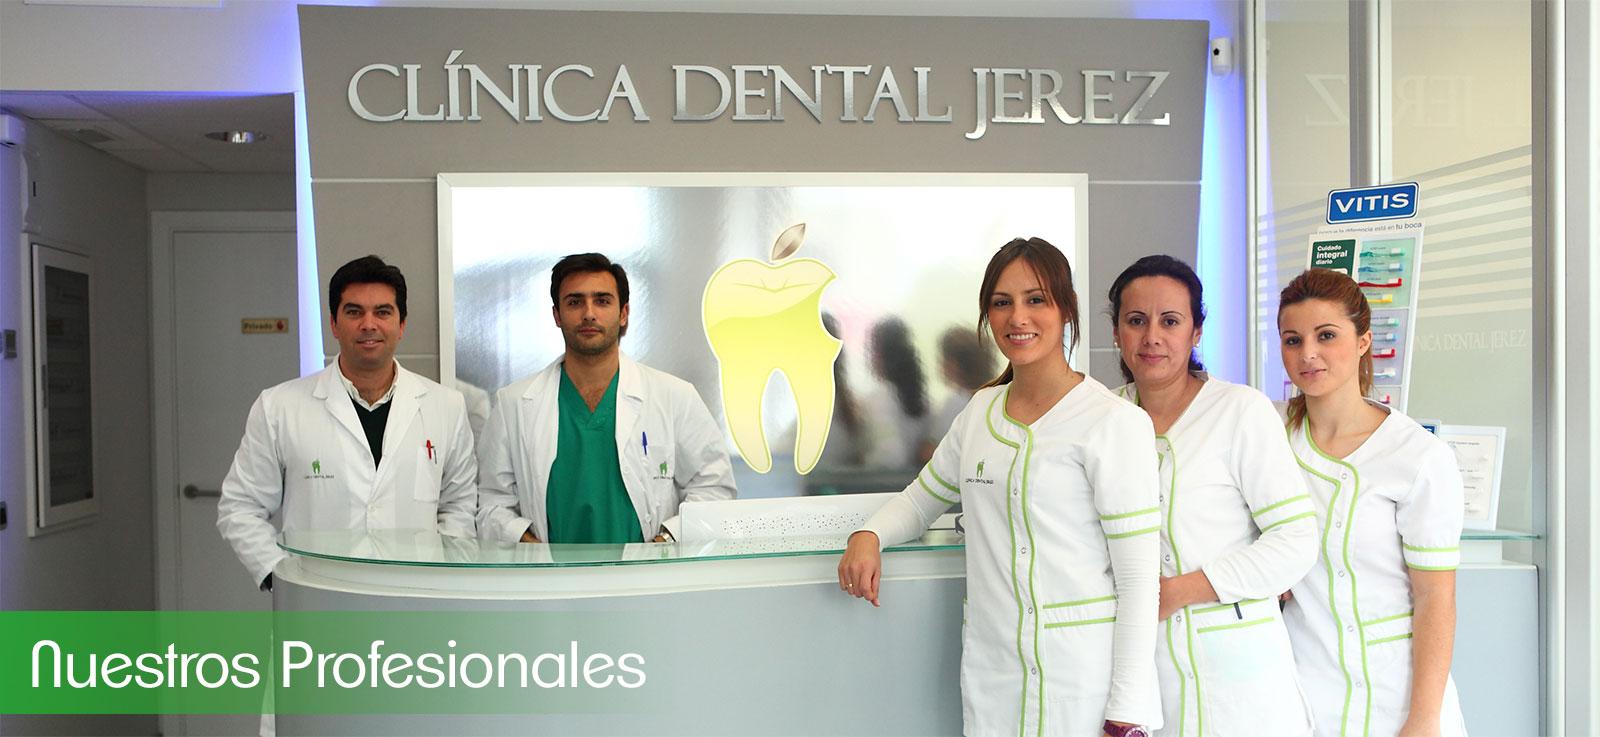 Nuestro profesionales clinica dental jerez for Clinica dental jerez de la frontera